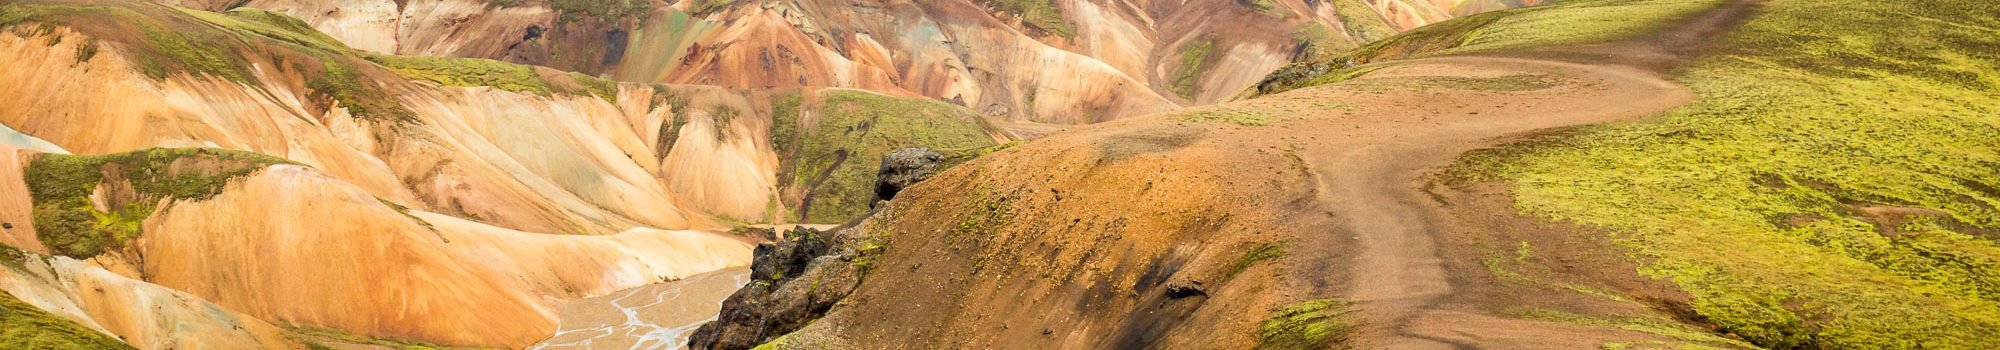 Iceland-Landmannalaugar- Laugavegur-hike-trekking (11)Iceland-Landmannalaugar- Laugavegur-hike-trekking (11)